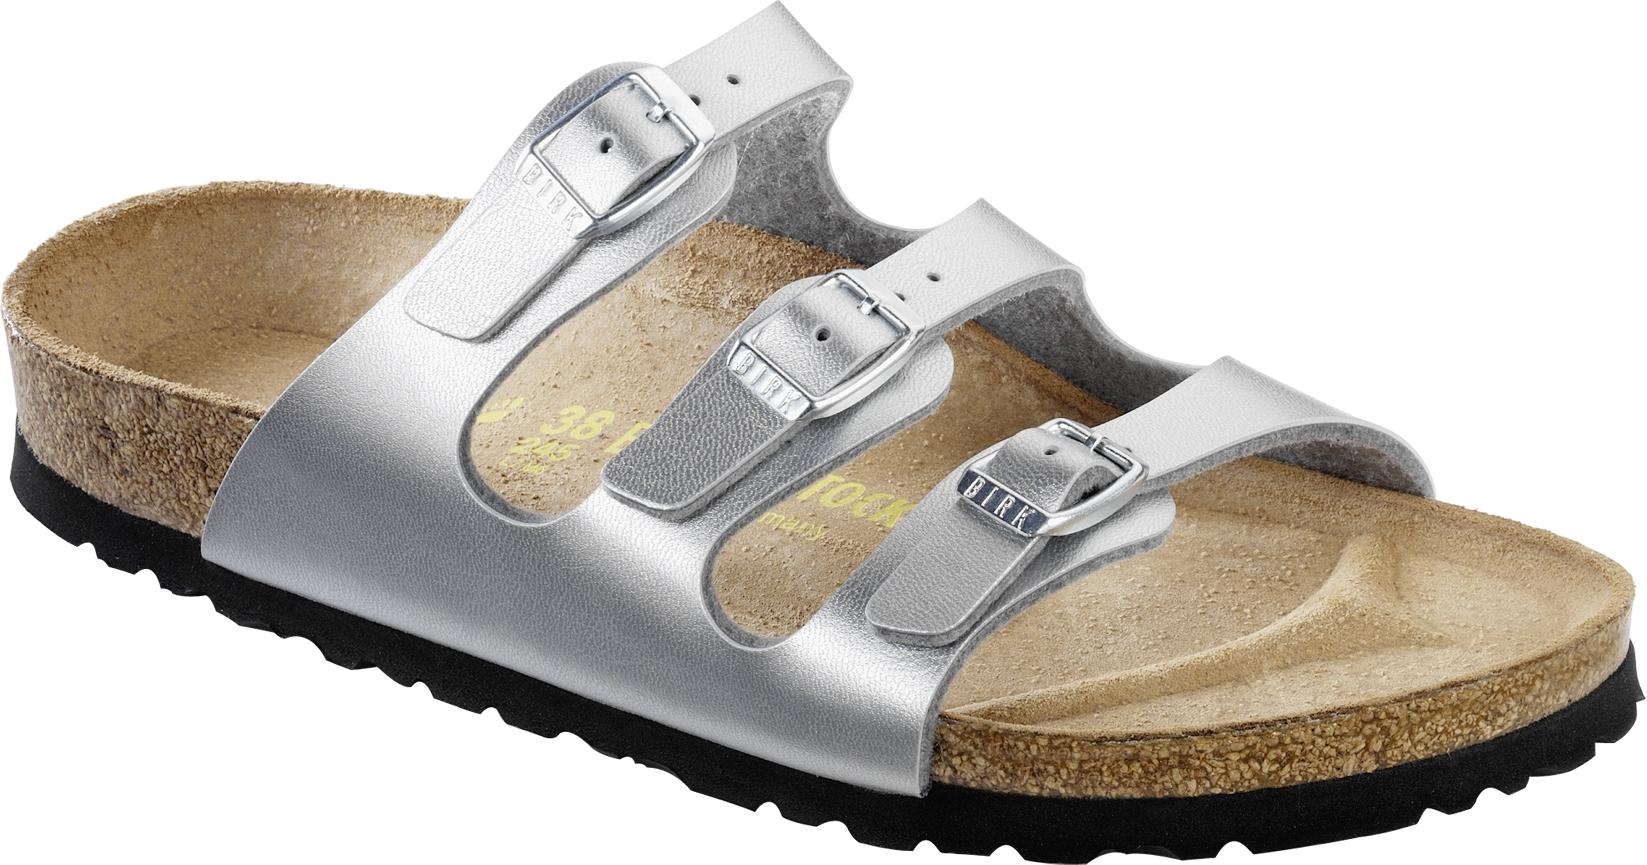 Birkenstock Florida Birko Flor Schuhe silver 954381 Damen Sandalen Weite normal | eBay